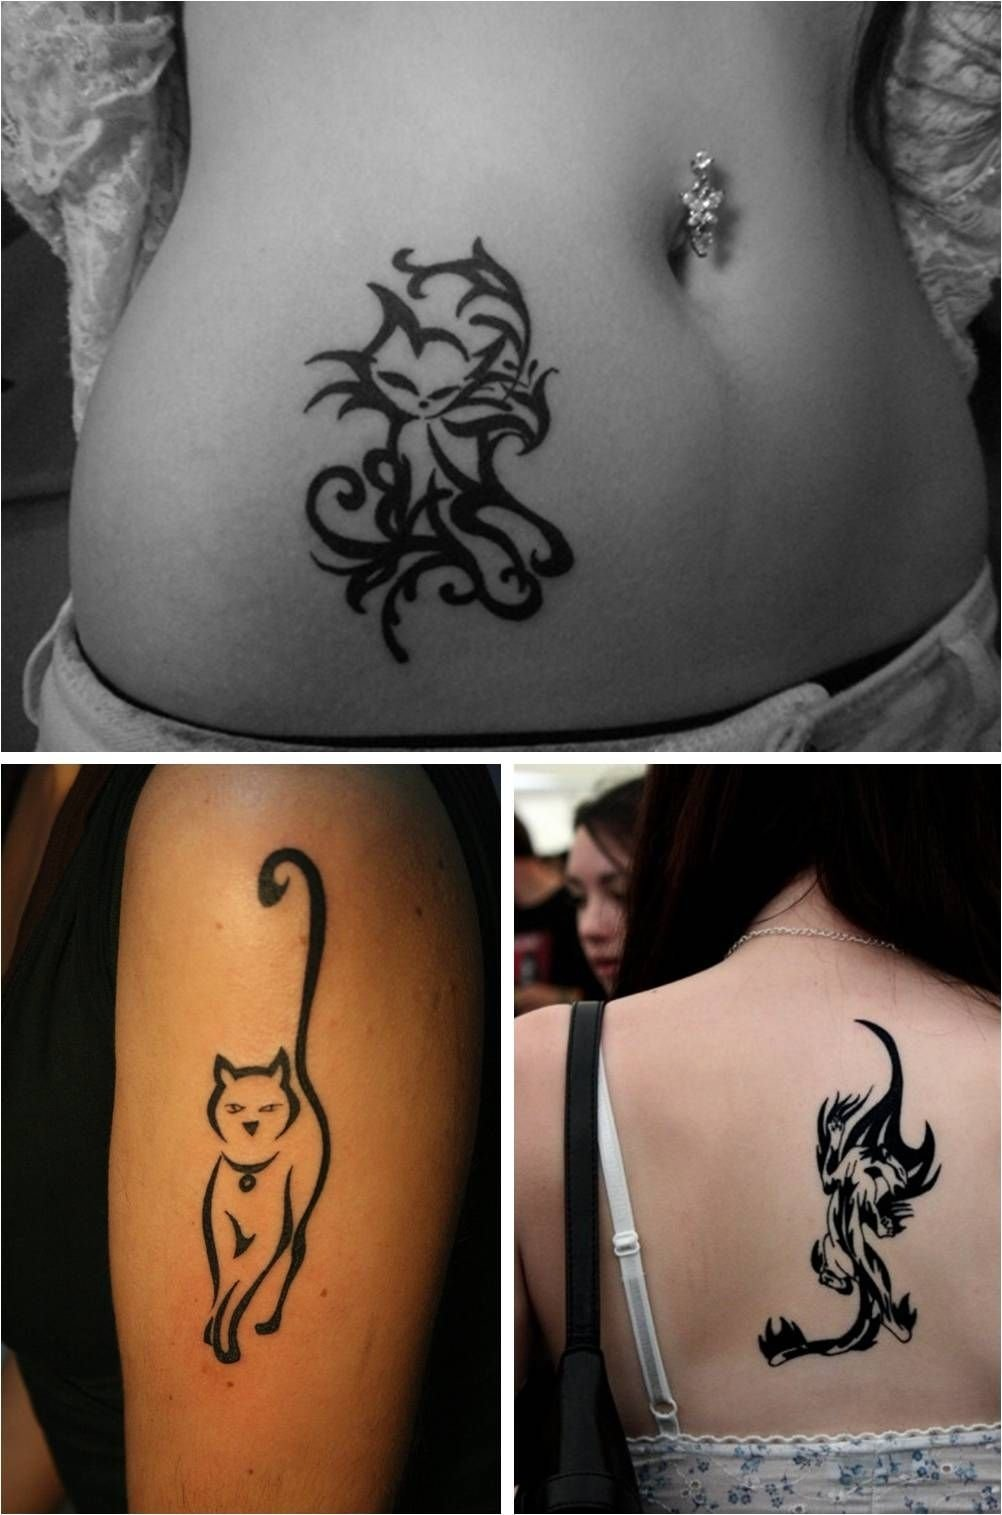 10 Perfect Good Tattoo Ideas For Girls tribal tattoos google search tattoos pinterest tribal tattoo 1 2021